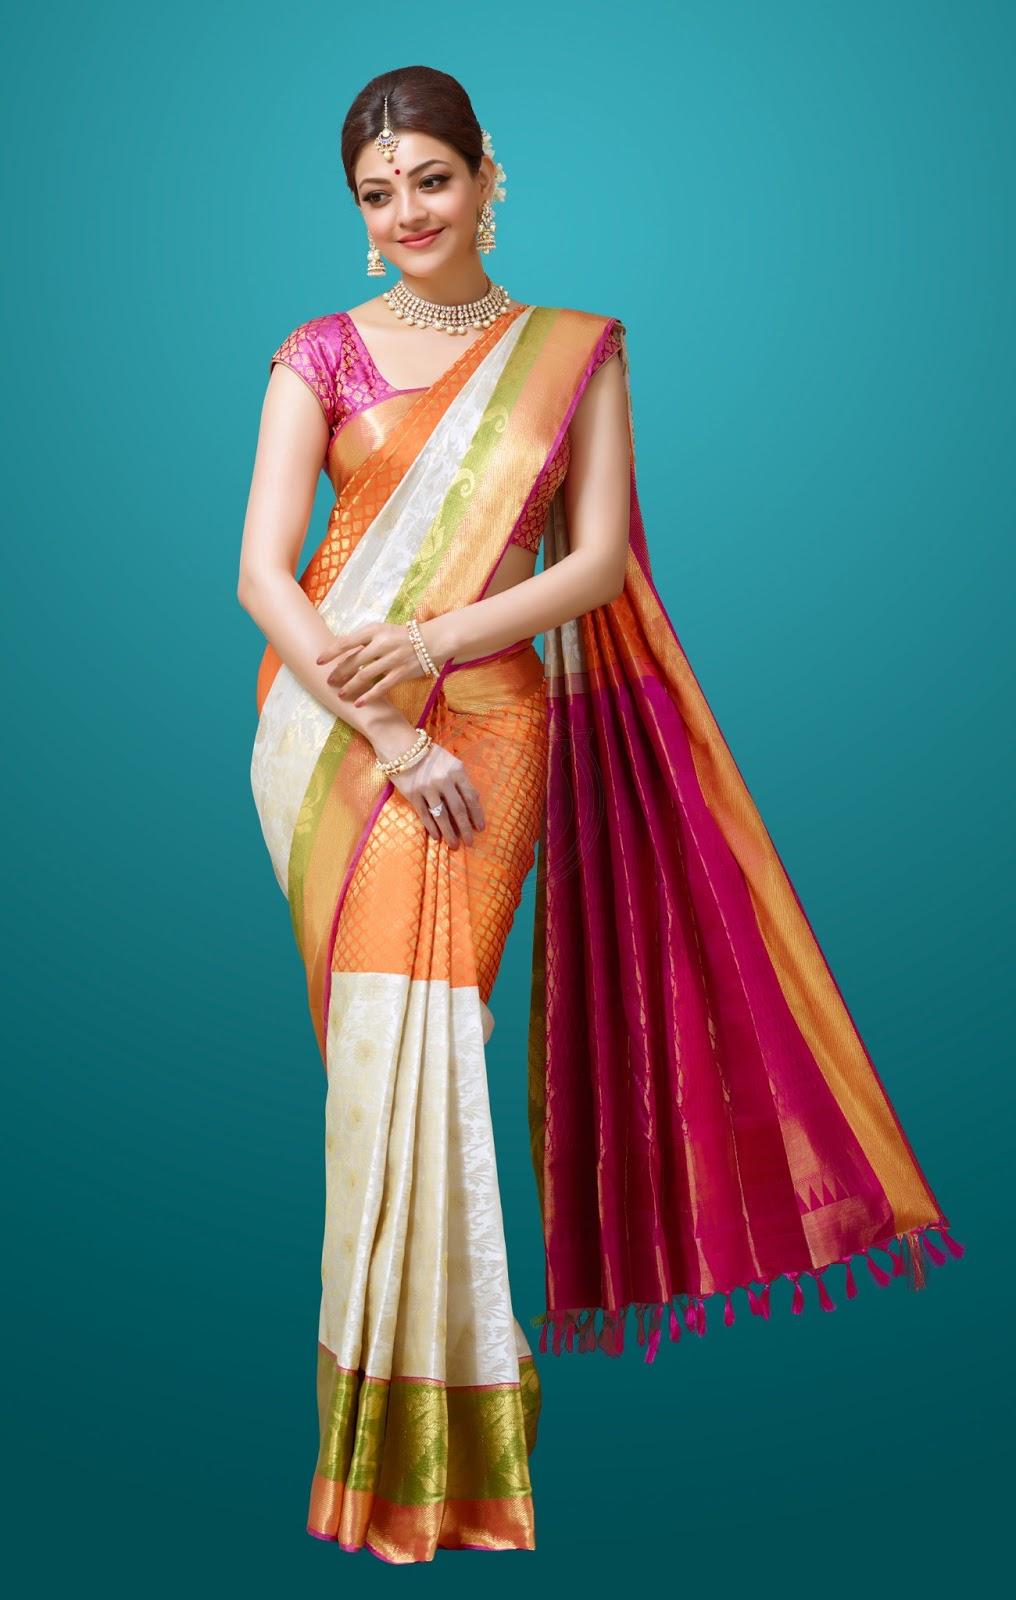 Kajal in Chennai Silks Ad